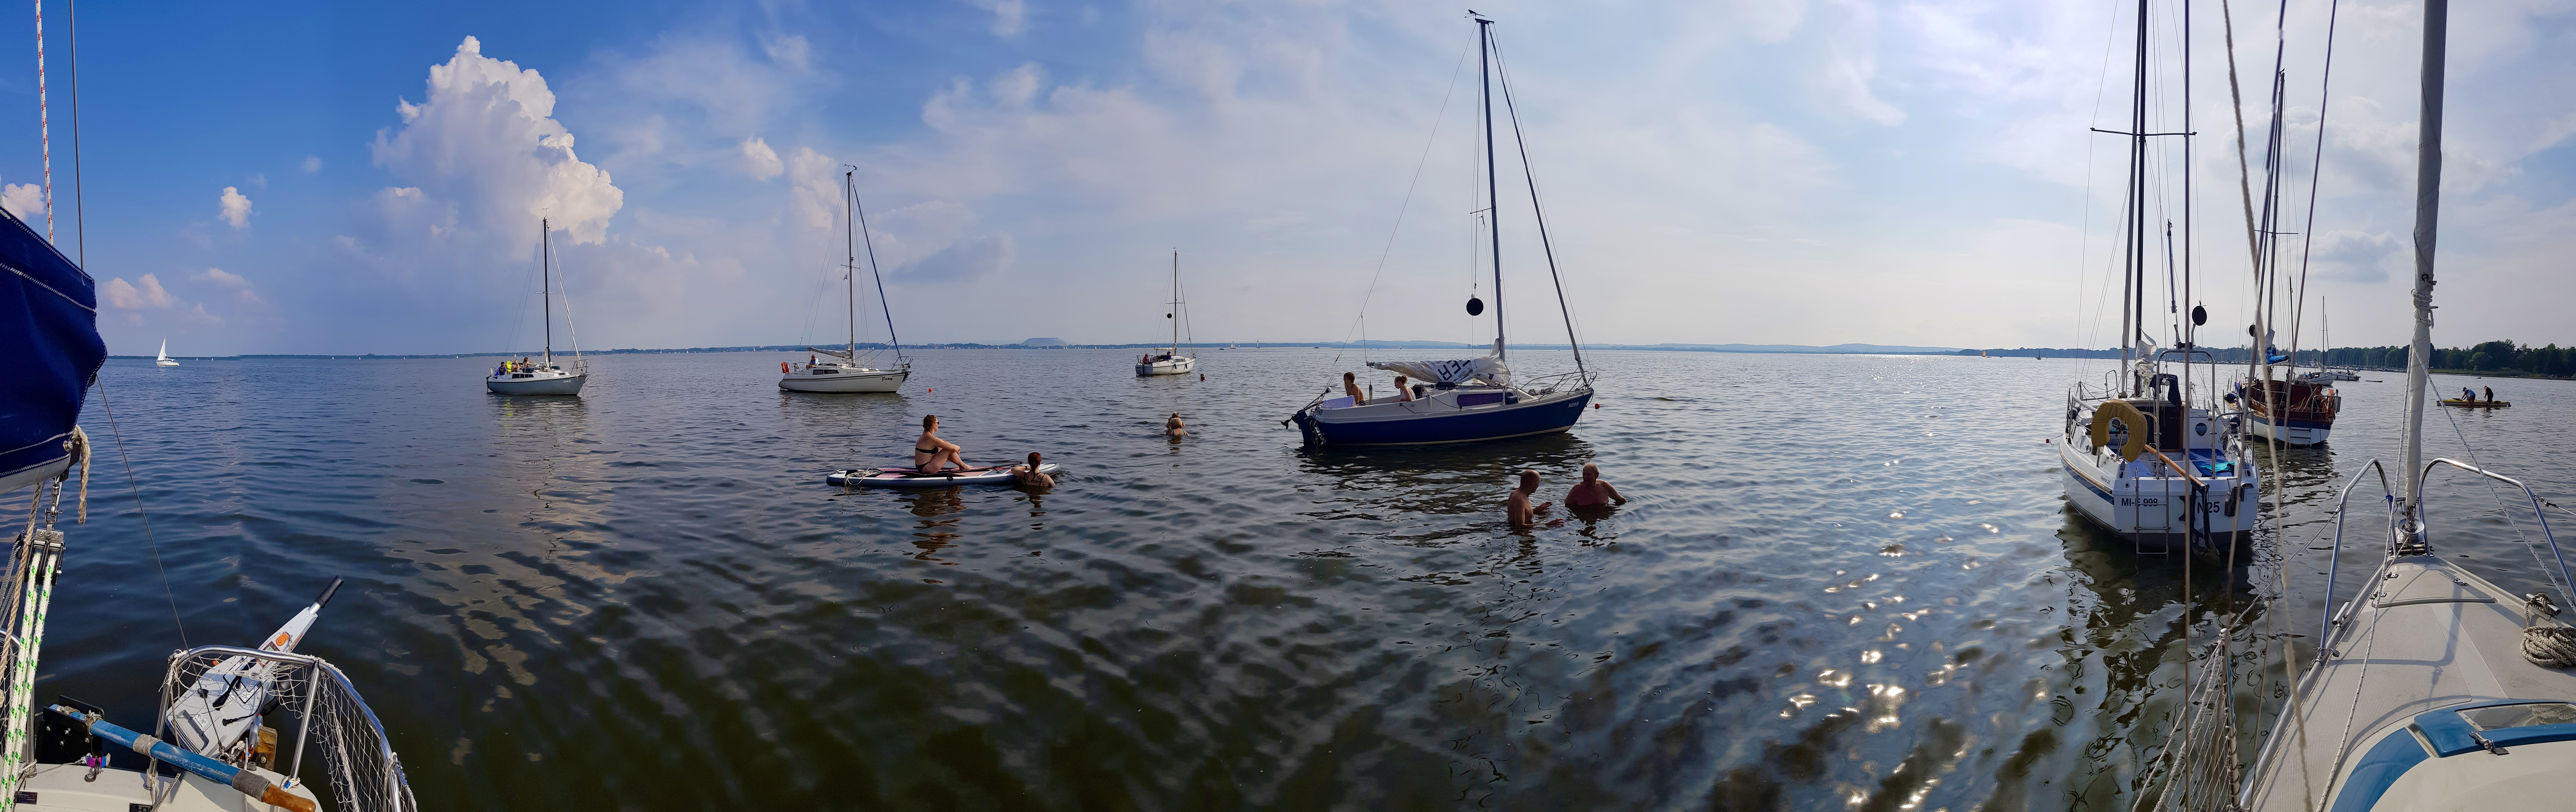 Wassersportverein Steinhuder Meer Mardorf e.V.